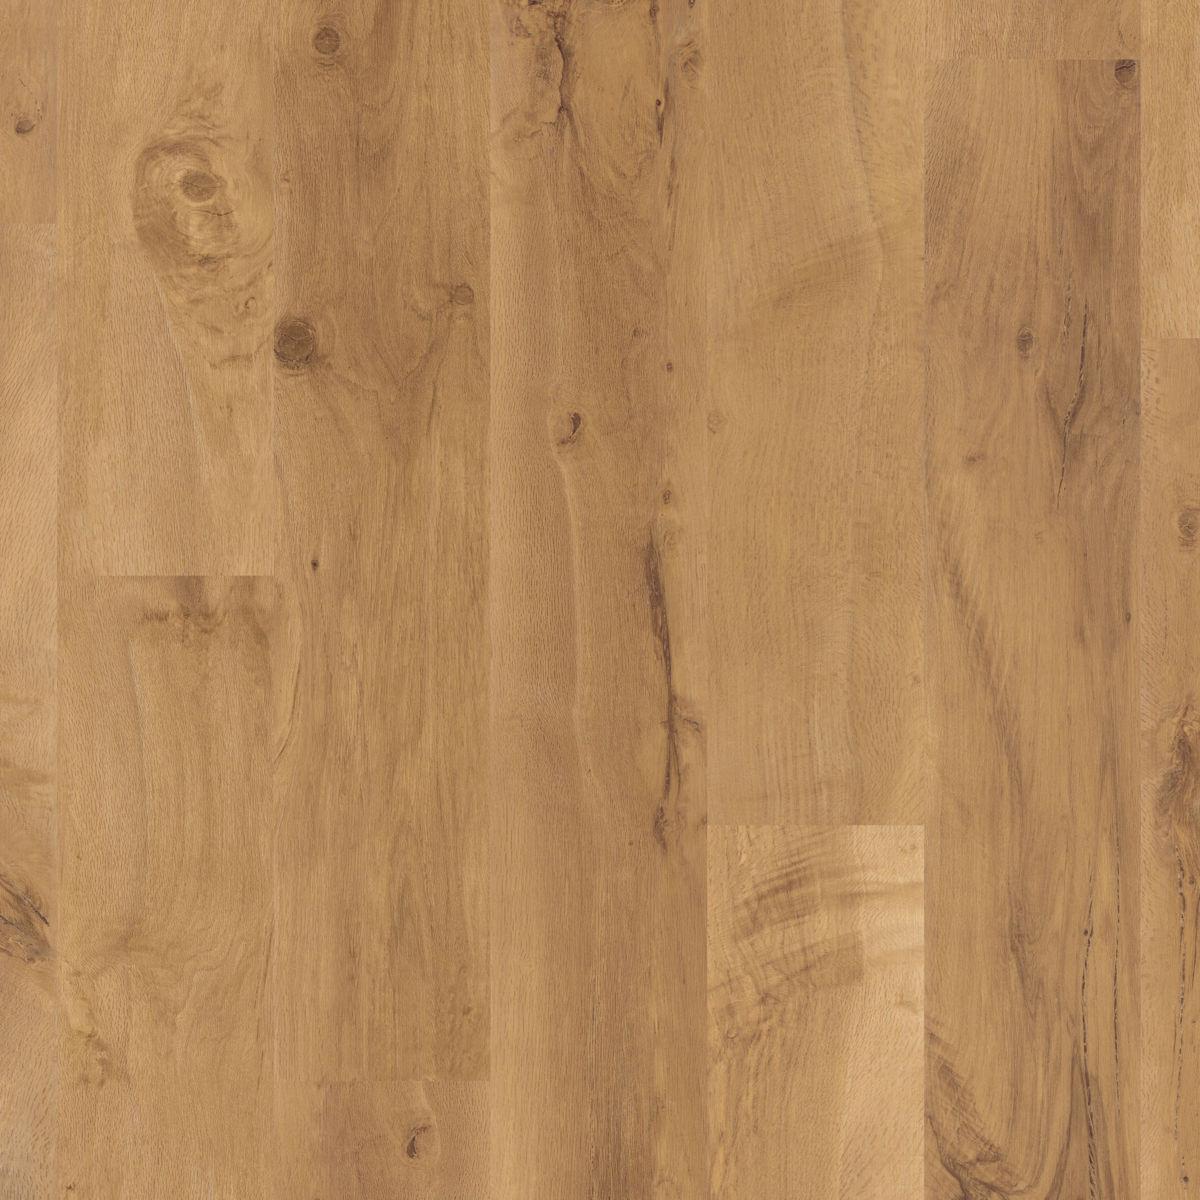 karndean van gogh auckland oak vgw52t vinyl flooring. Black Bedroom Furniture Sets. Home Design Ideas